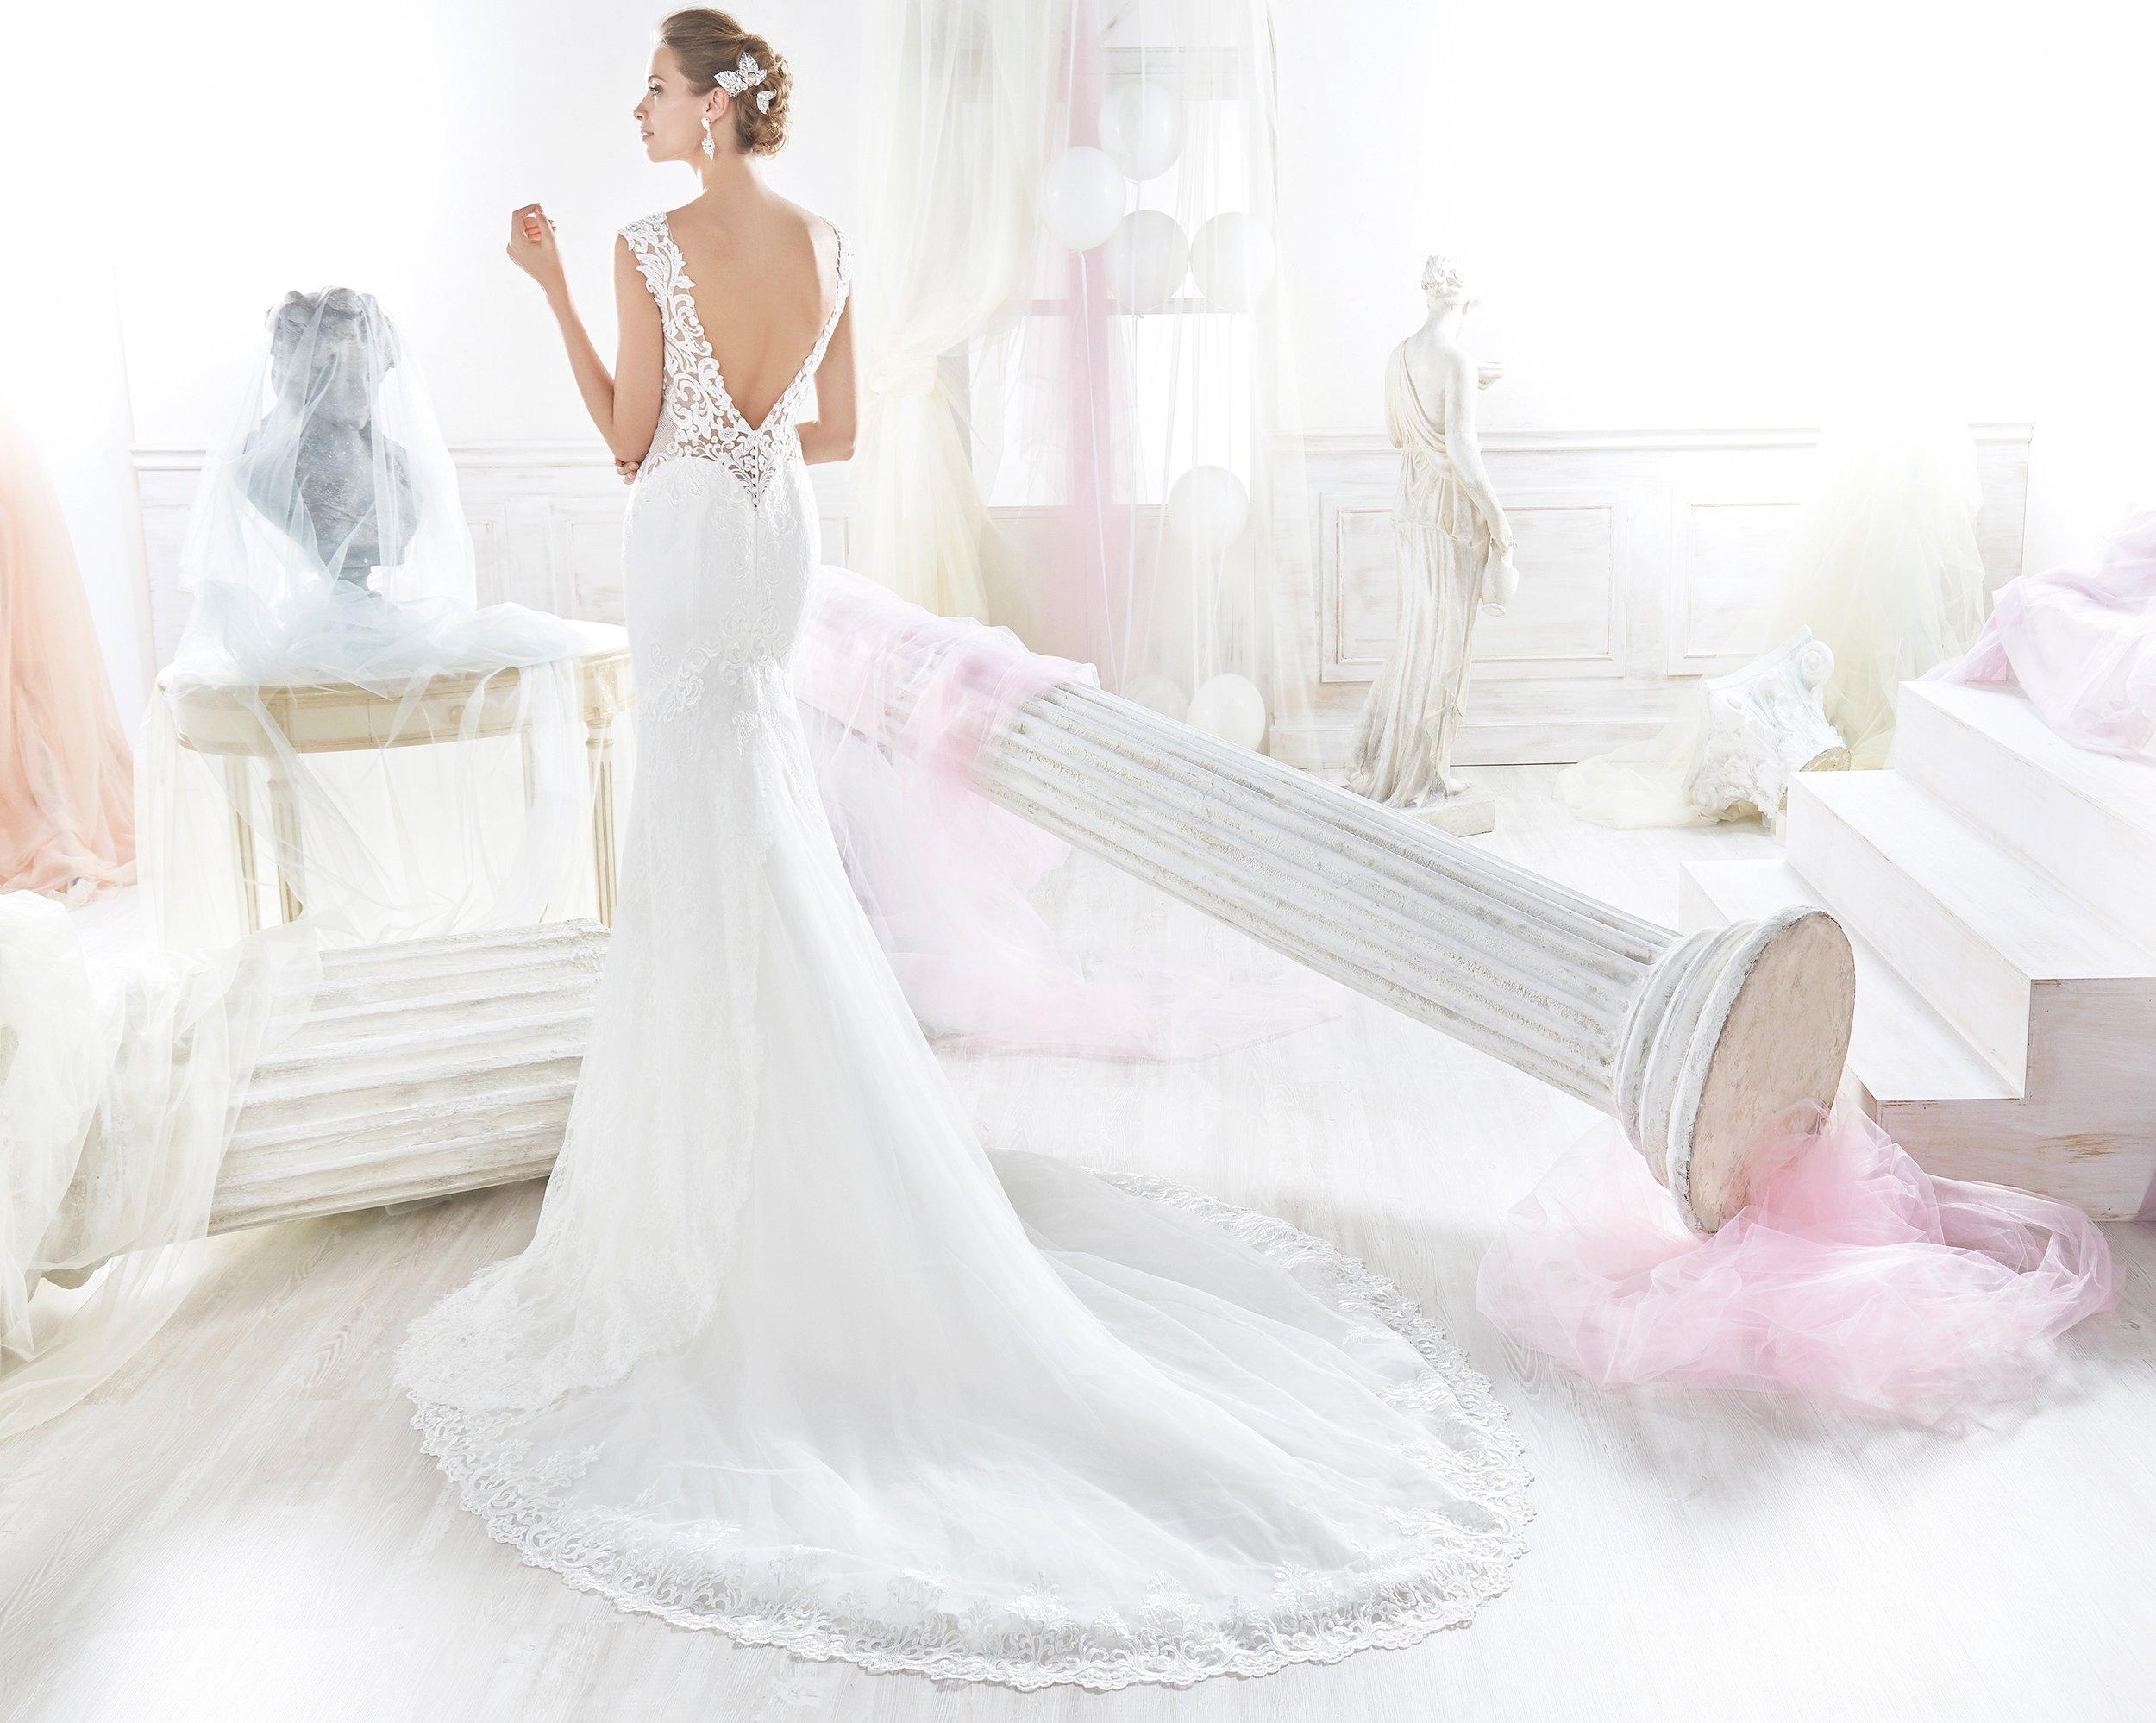 nicole-spose-NIAB18057-Nicole-moda-sposa-2018-178.jpg